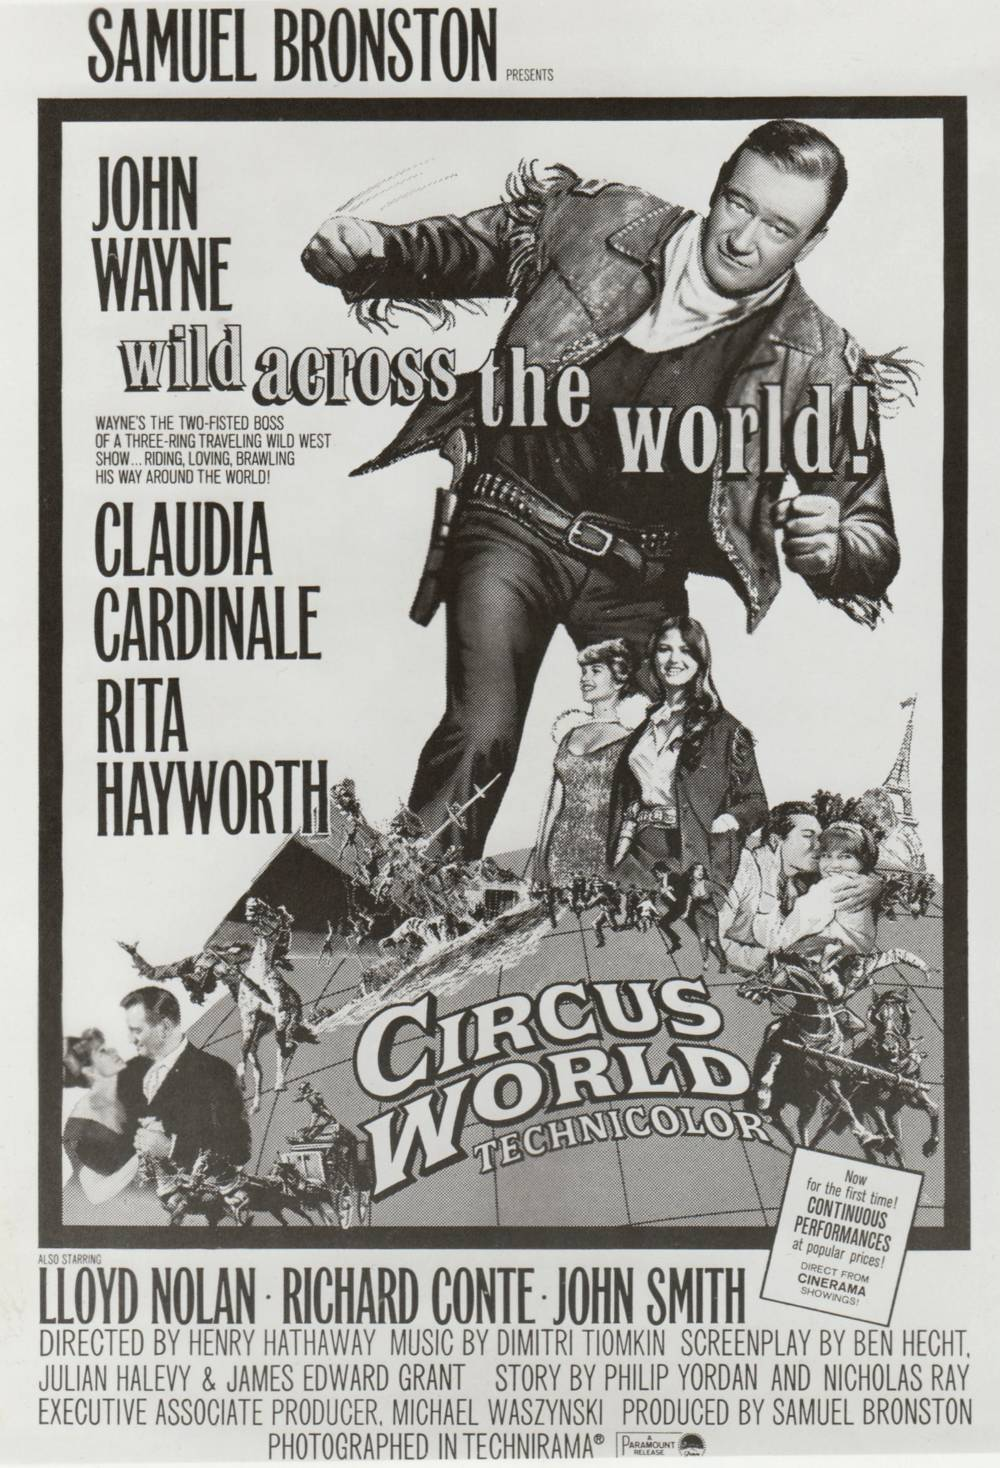 Le Plus Grand Cirque du Monde - Circus World - 1964  - Page 2 A_duk322